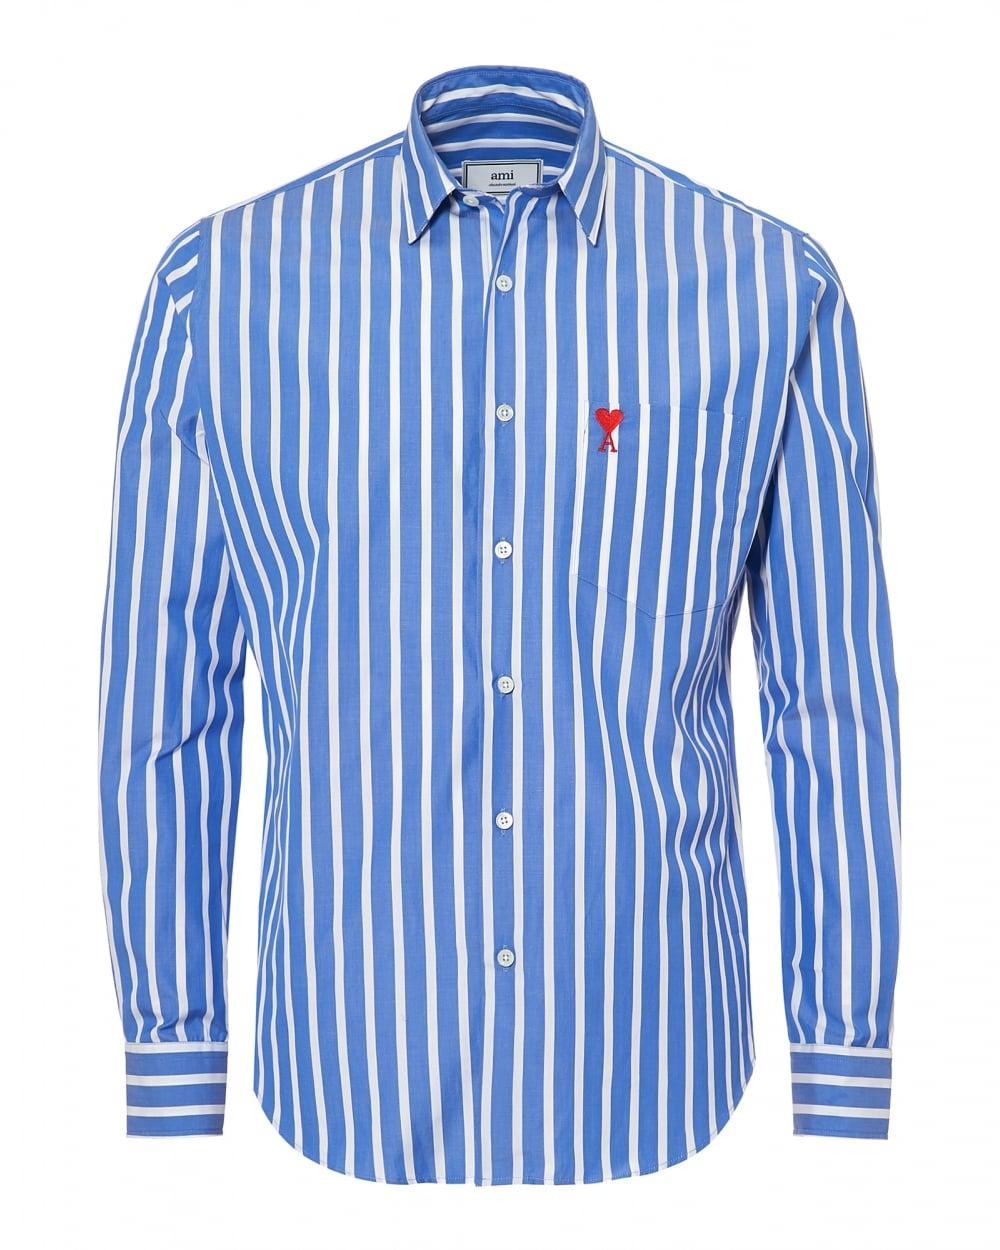 Wedding White Or Blue Shirt: Ami Mens Summer Fit Broad Stripe Blue White Shirt